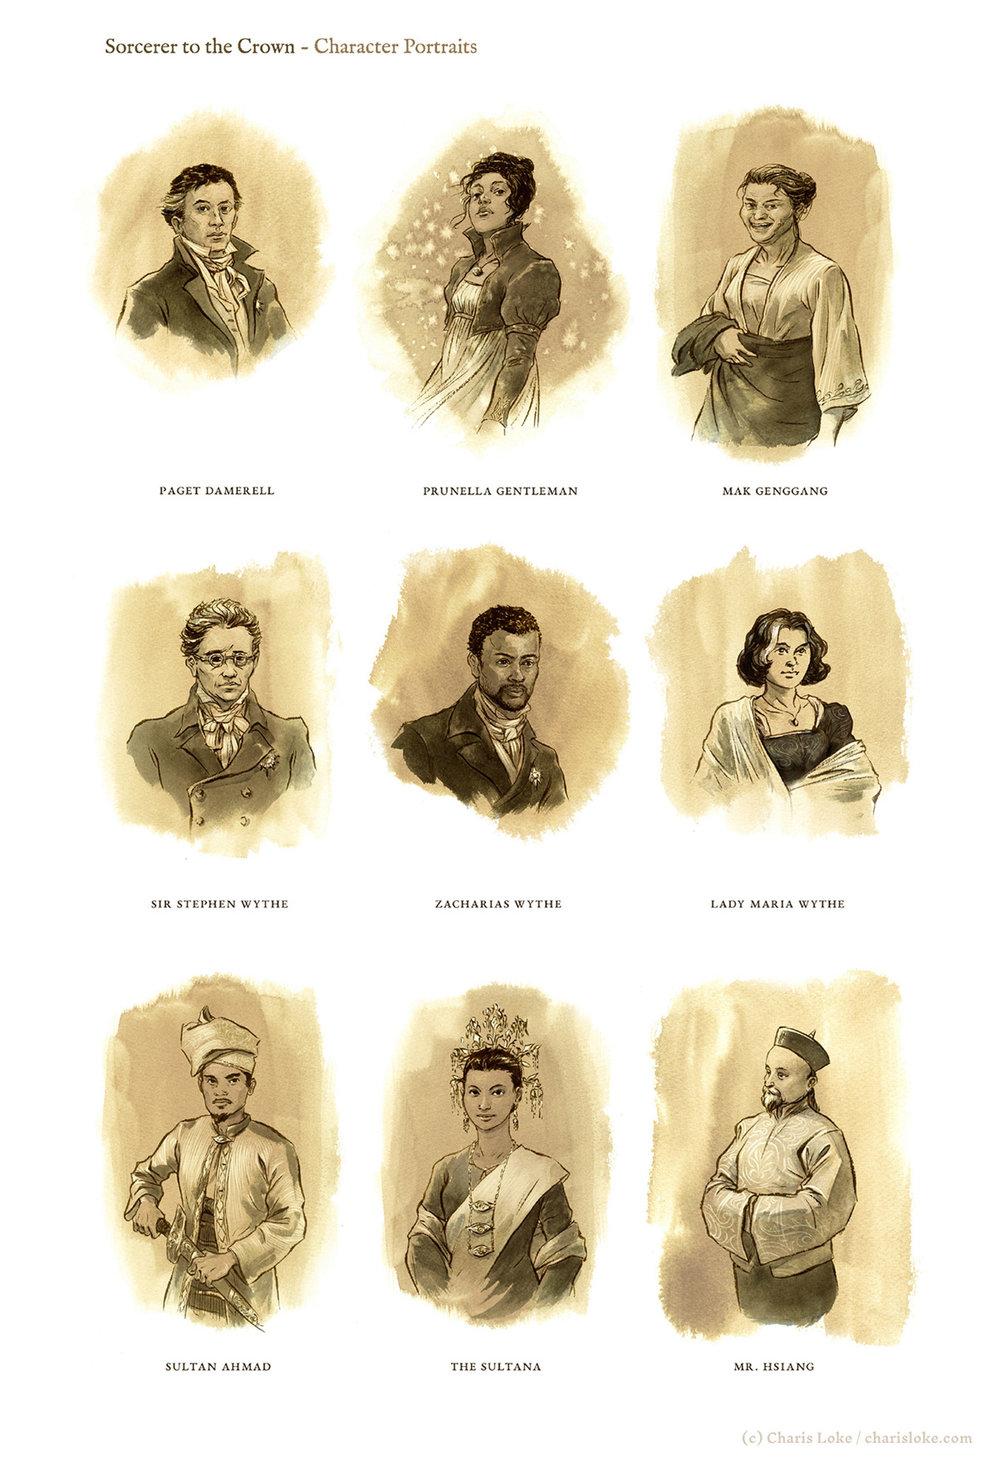 CharisLoke_Sorcerer_Character_Portraits_Web.jpg